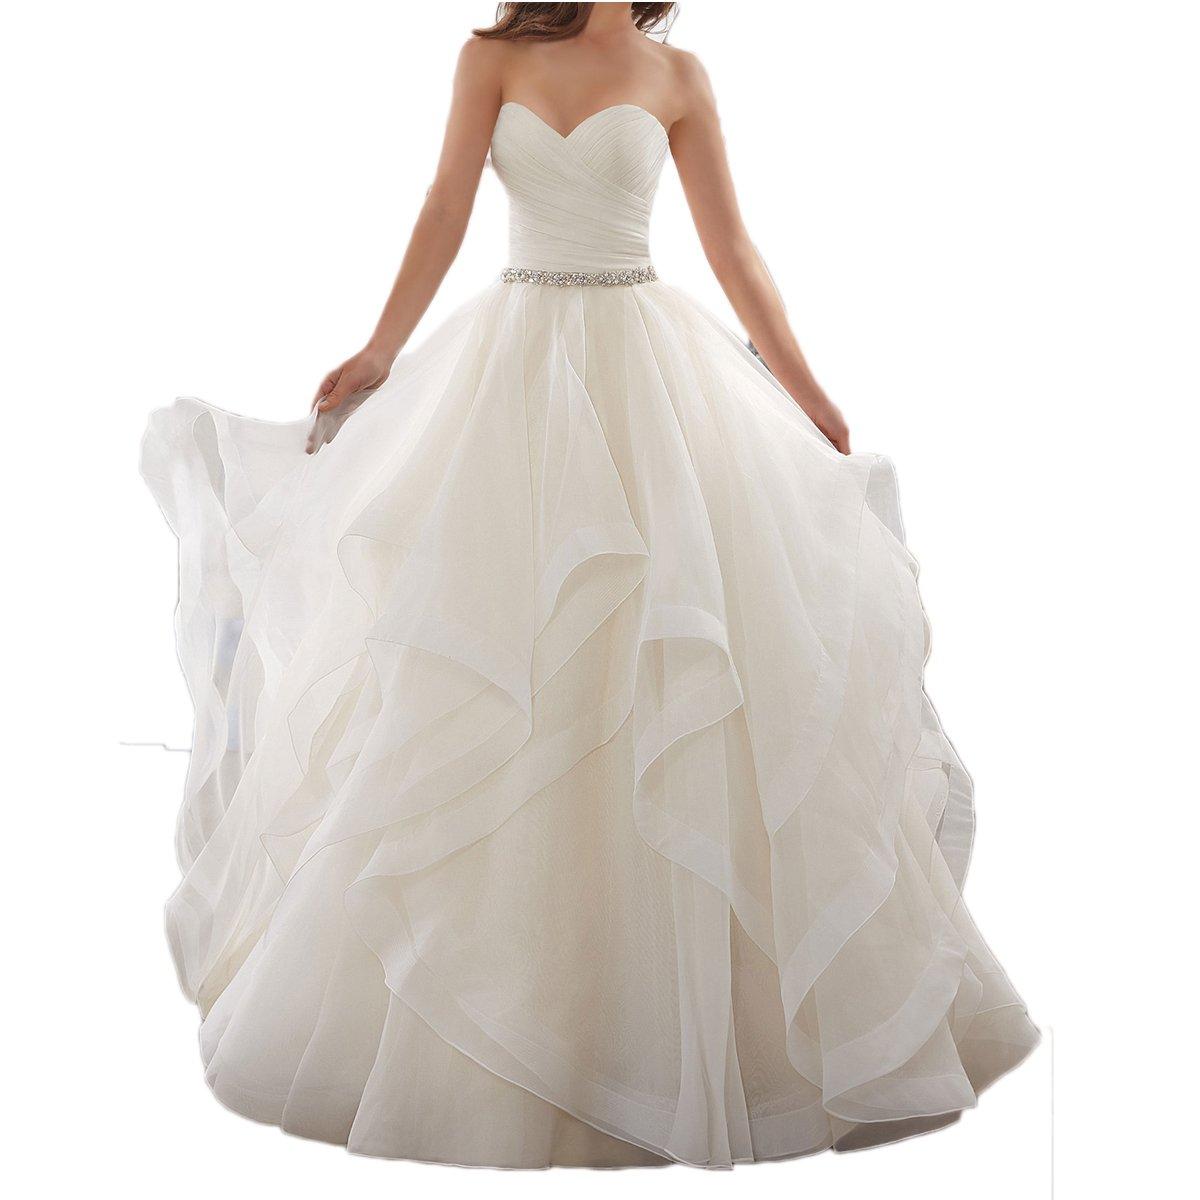 Westcorler Sweetheart Wedding Dresses Beading Sash Ruffles Tulle Ball Gown (us4, Ivory) by Westcorler